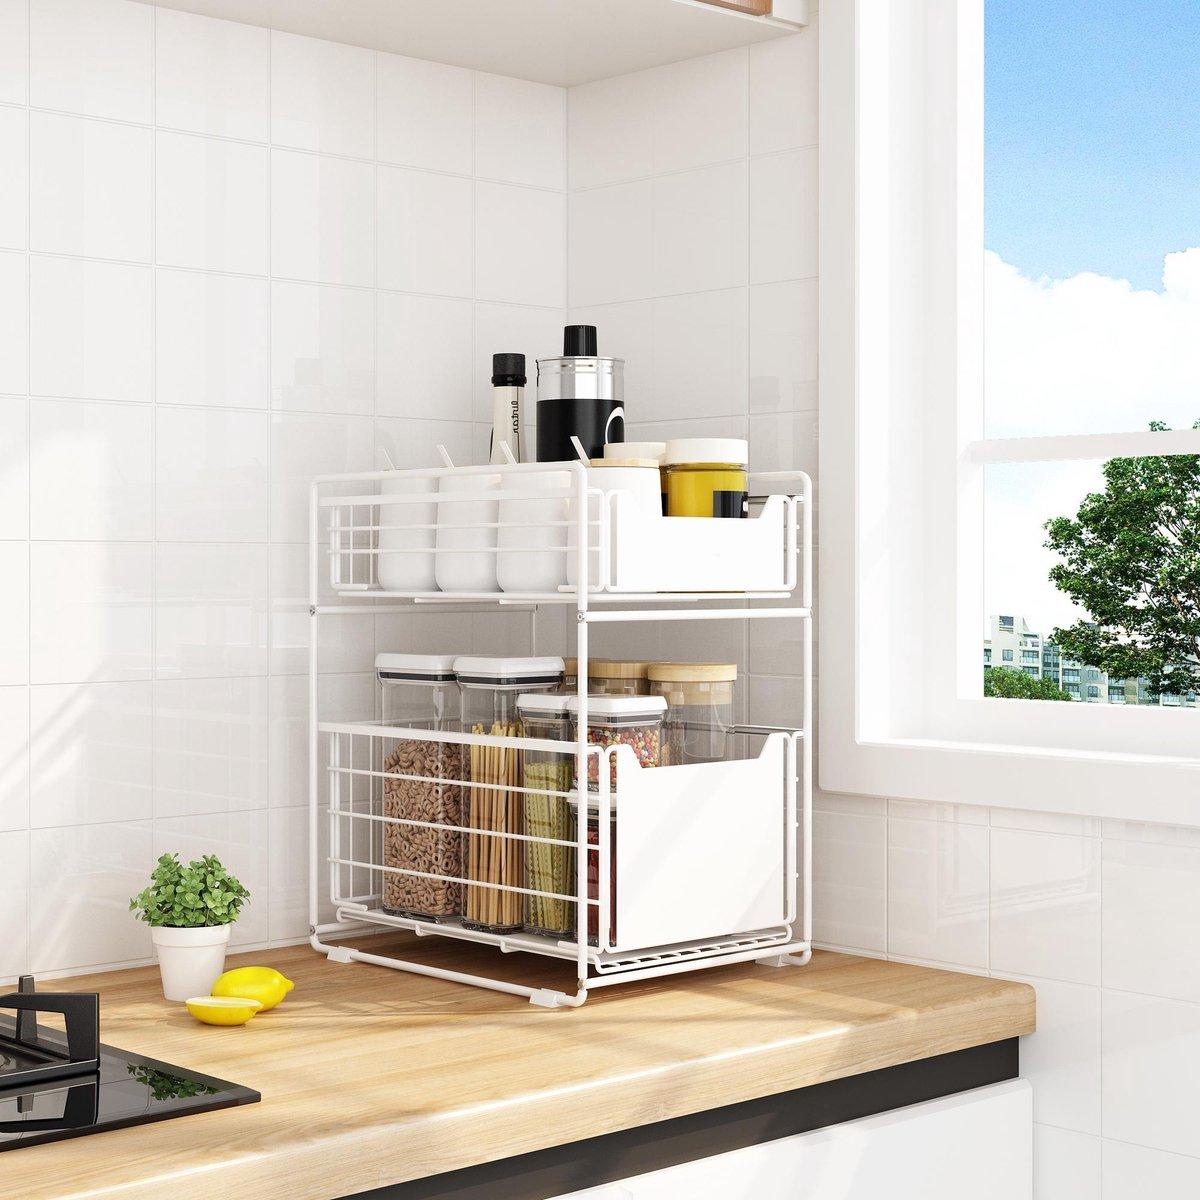 BROËL Organizer – Ladekast - Opbergrek - Aanrecht Organiser – Keuken Organizers - Ladeblok - Kast Or